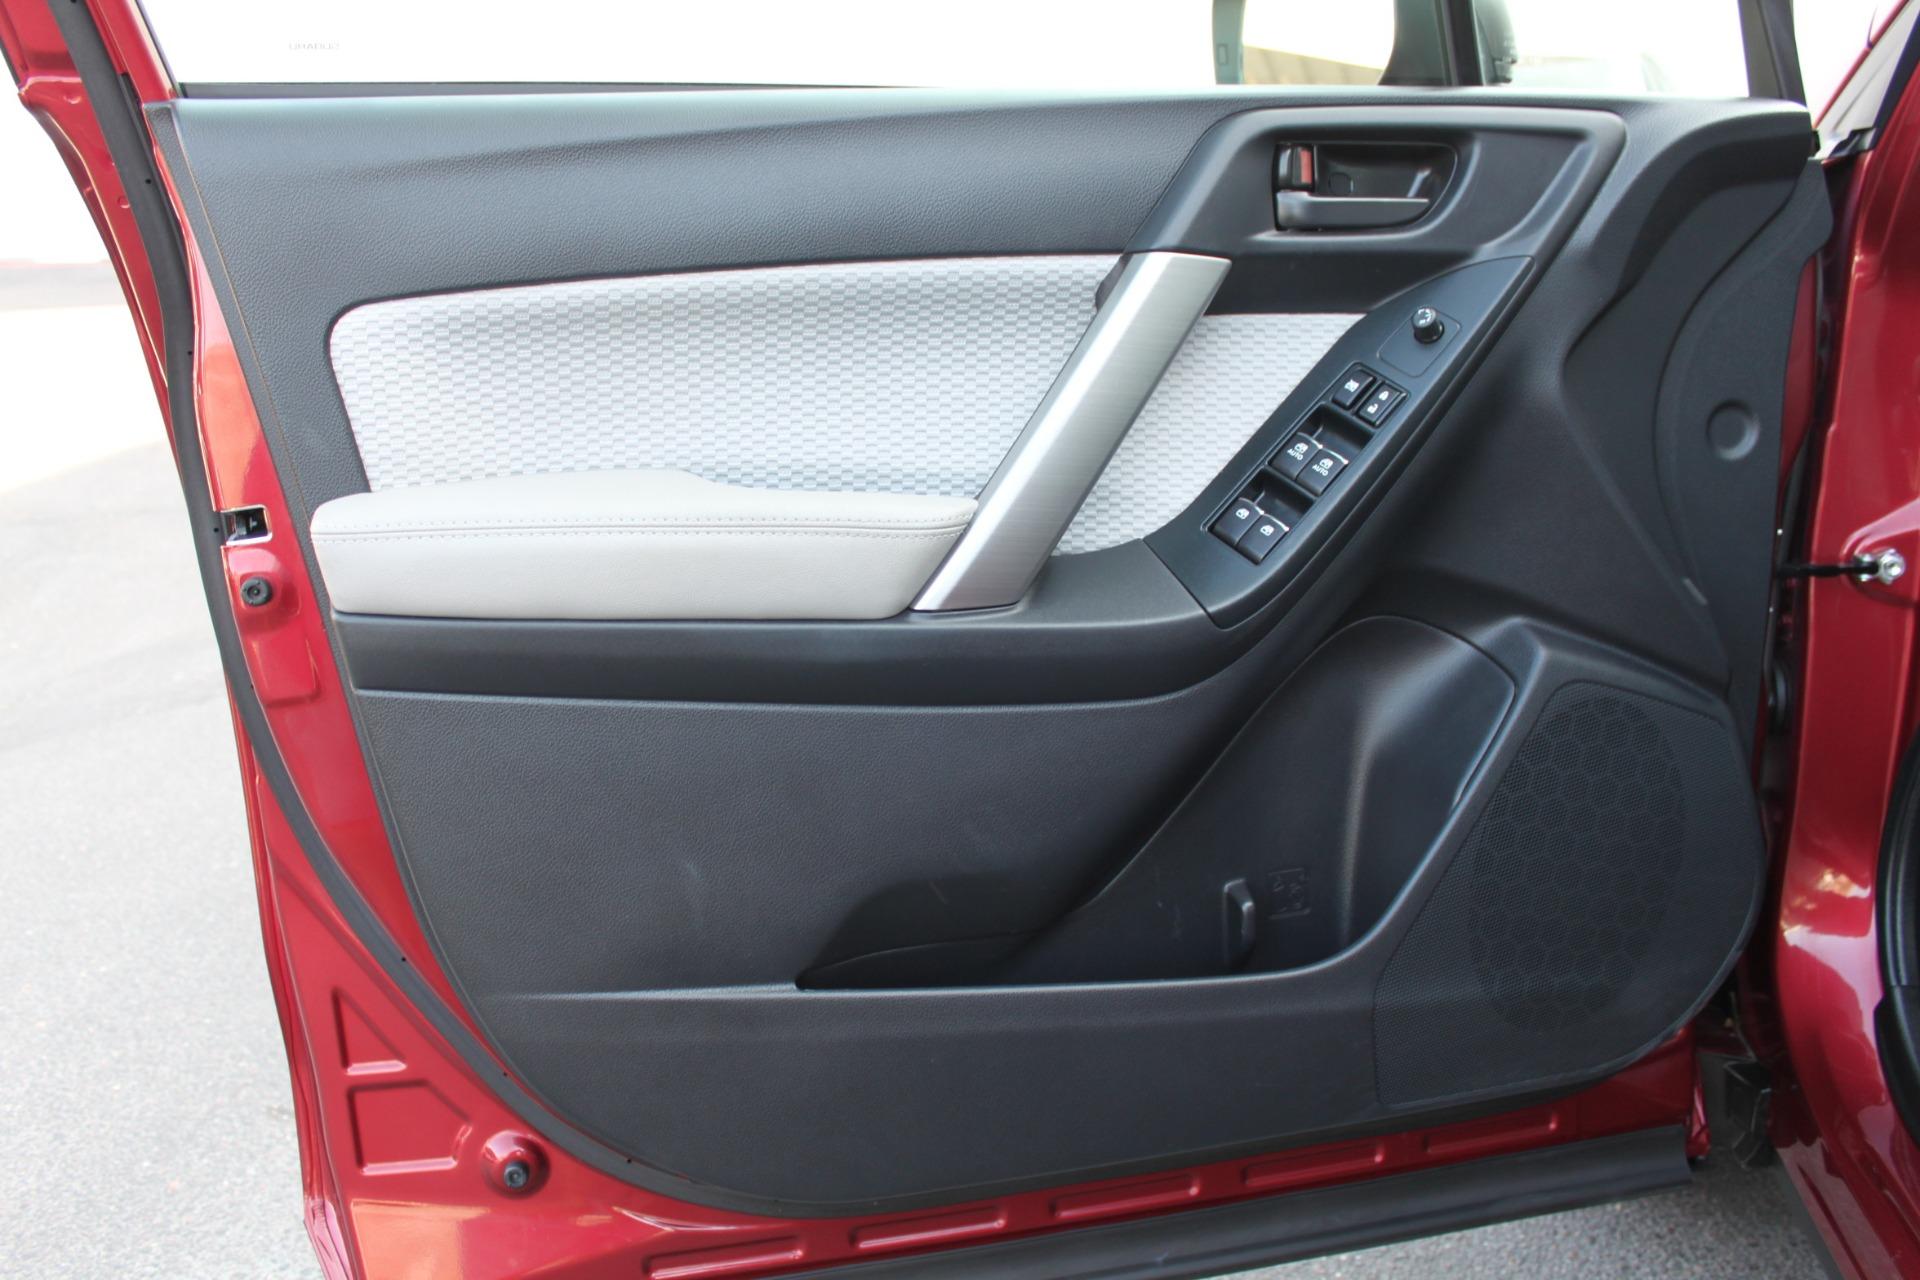 Used-2017-Subaru-Forester-25i-All-Wheel-Drive-25i-XJ